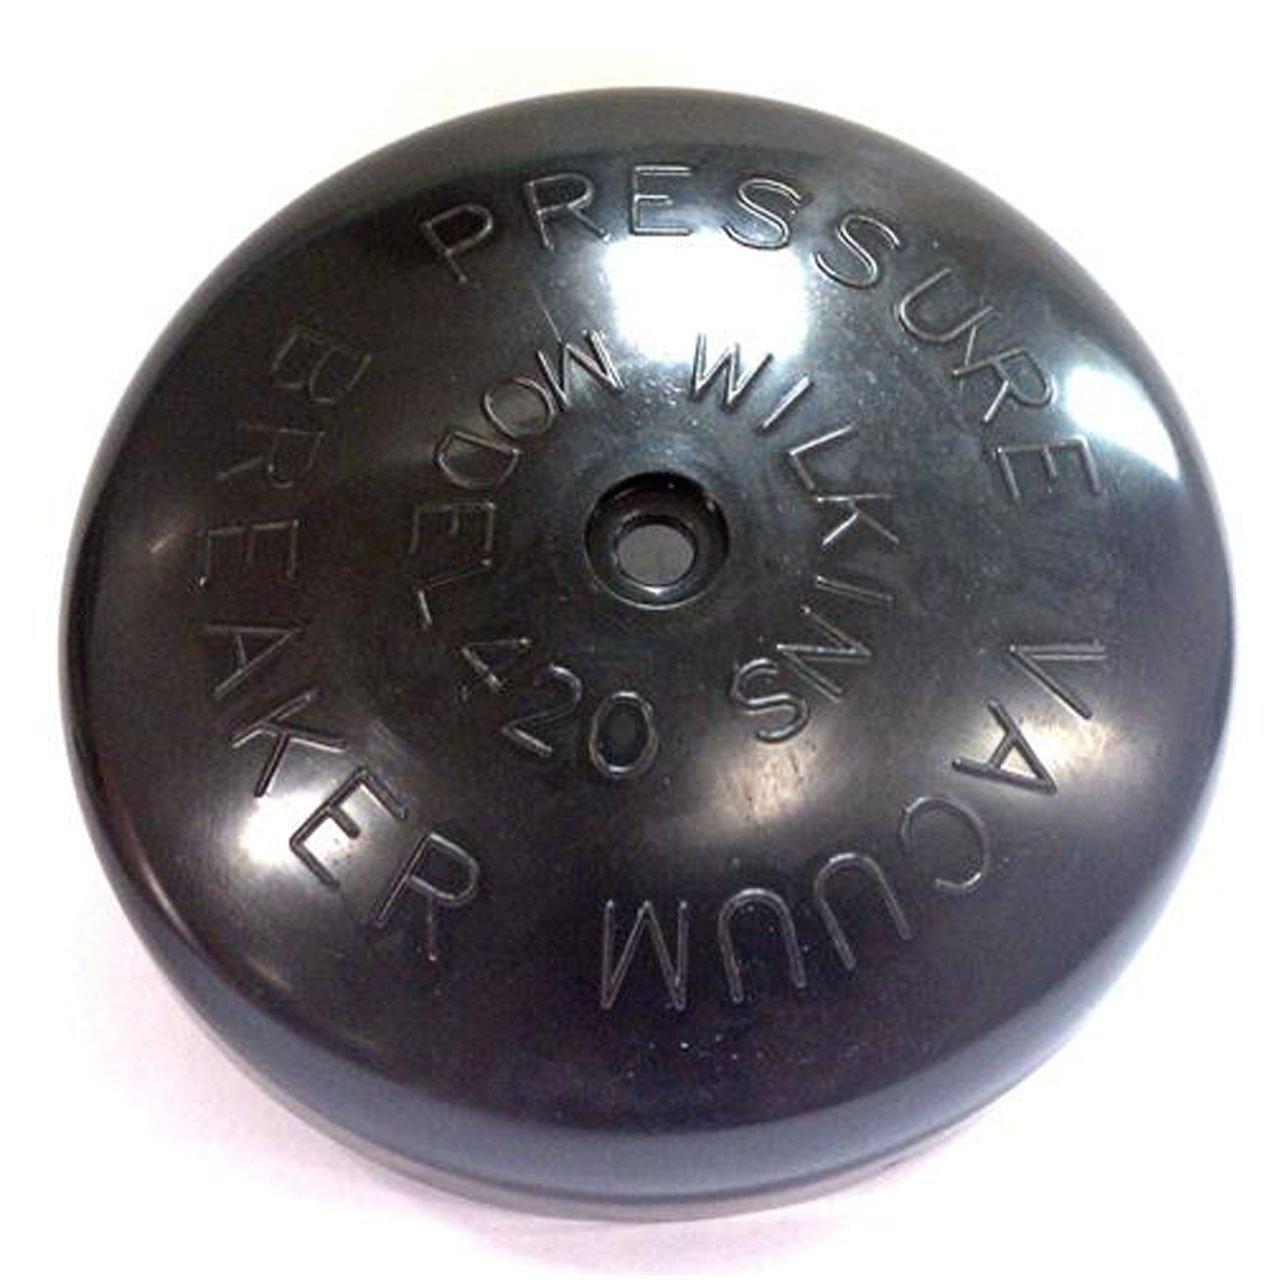 423-3 inch 420 mẫu